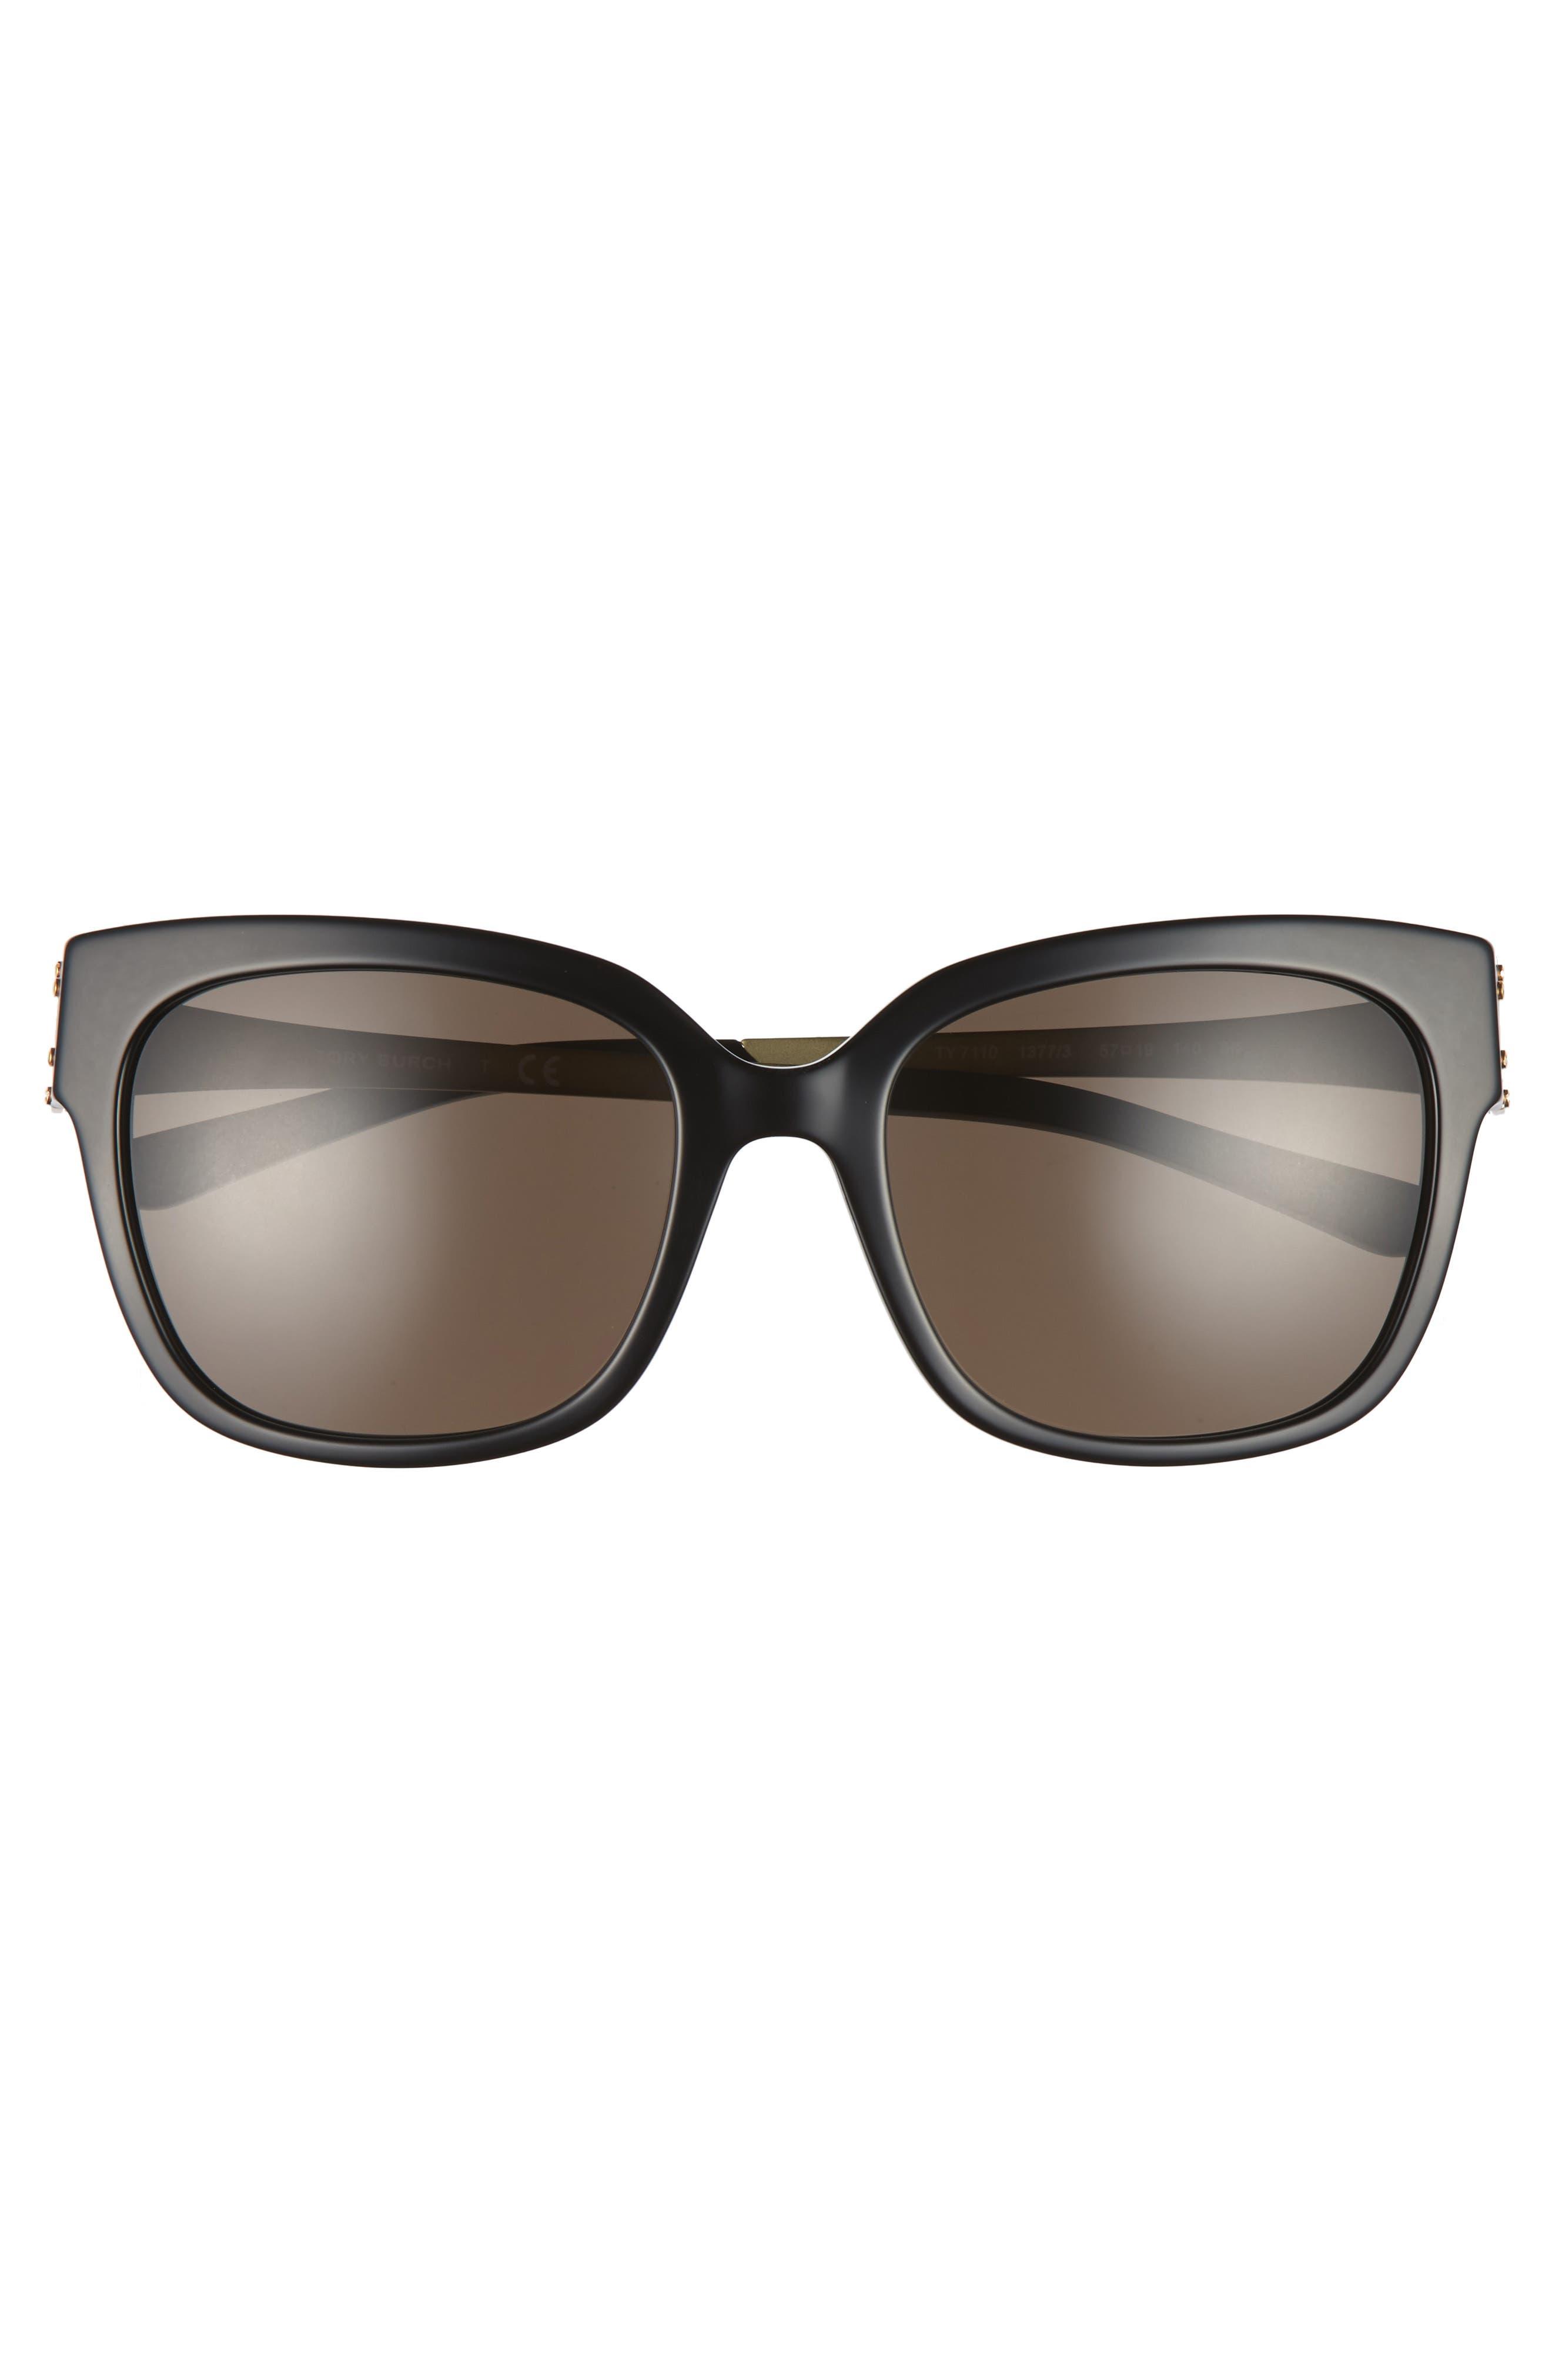 57mm Sunglasses,                             Alternate thumbnail 3, color,                             001